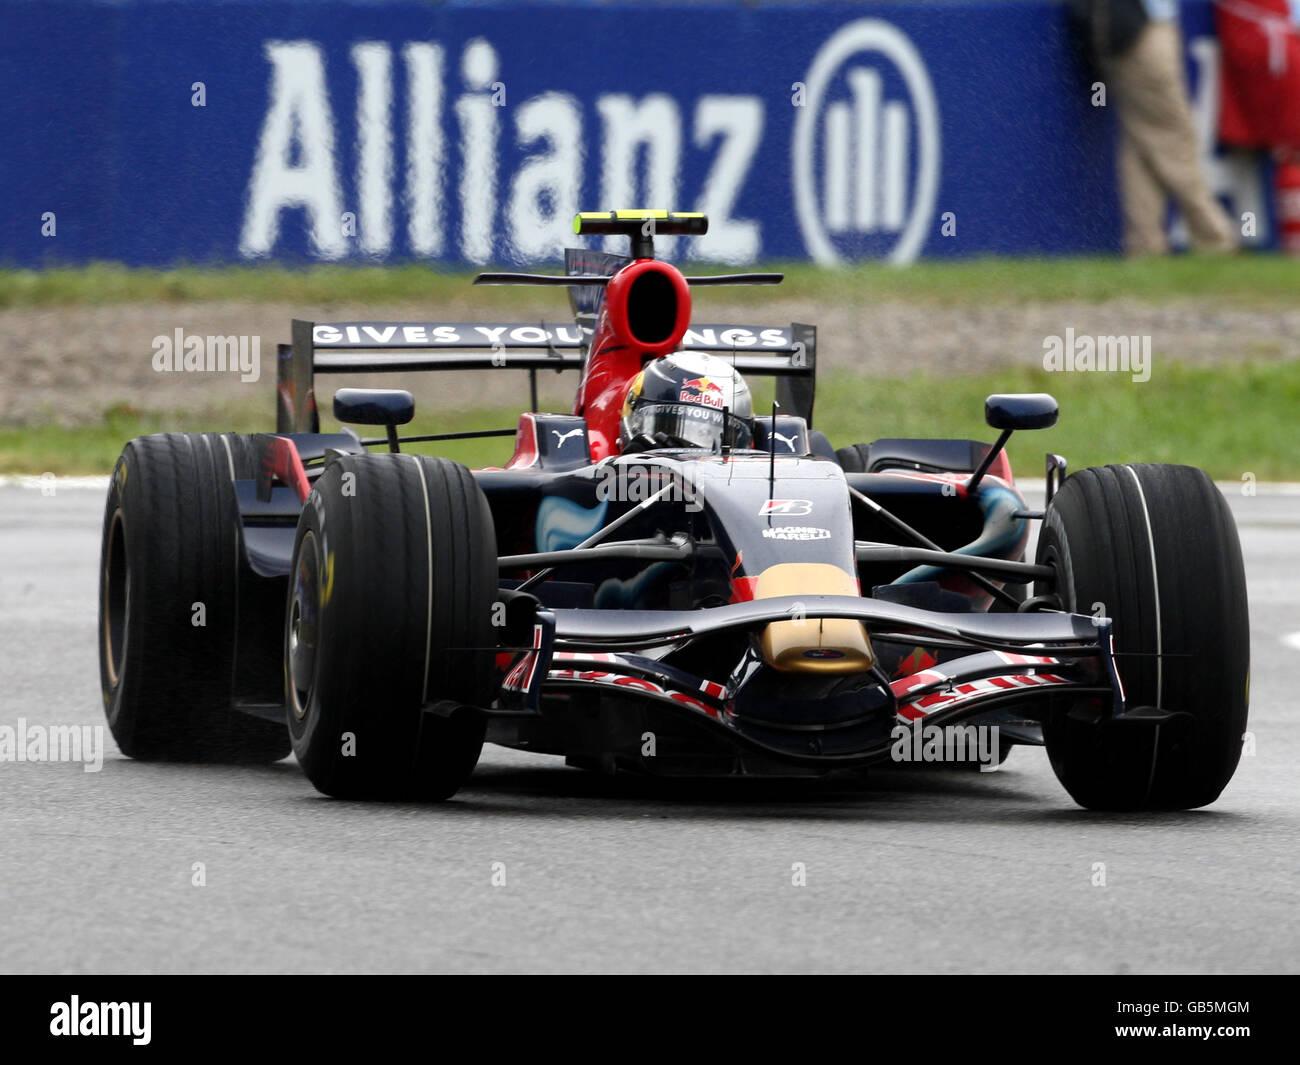 Formula One Motor Racing - Italian Grand Prix - Monza Stock